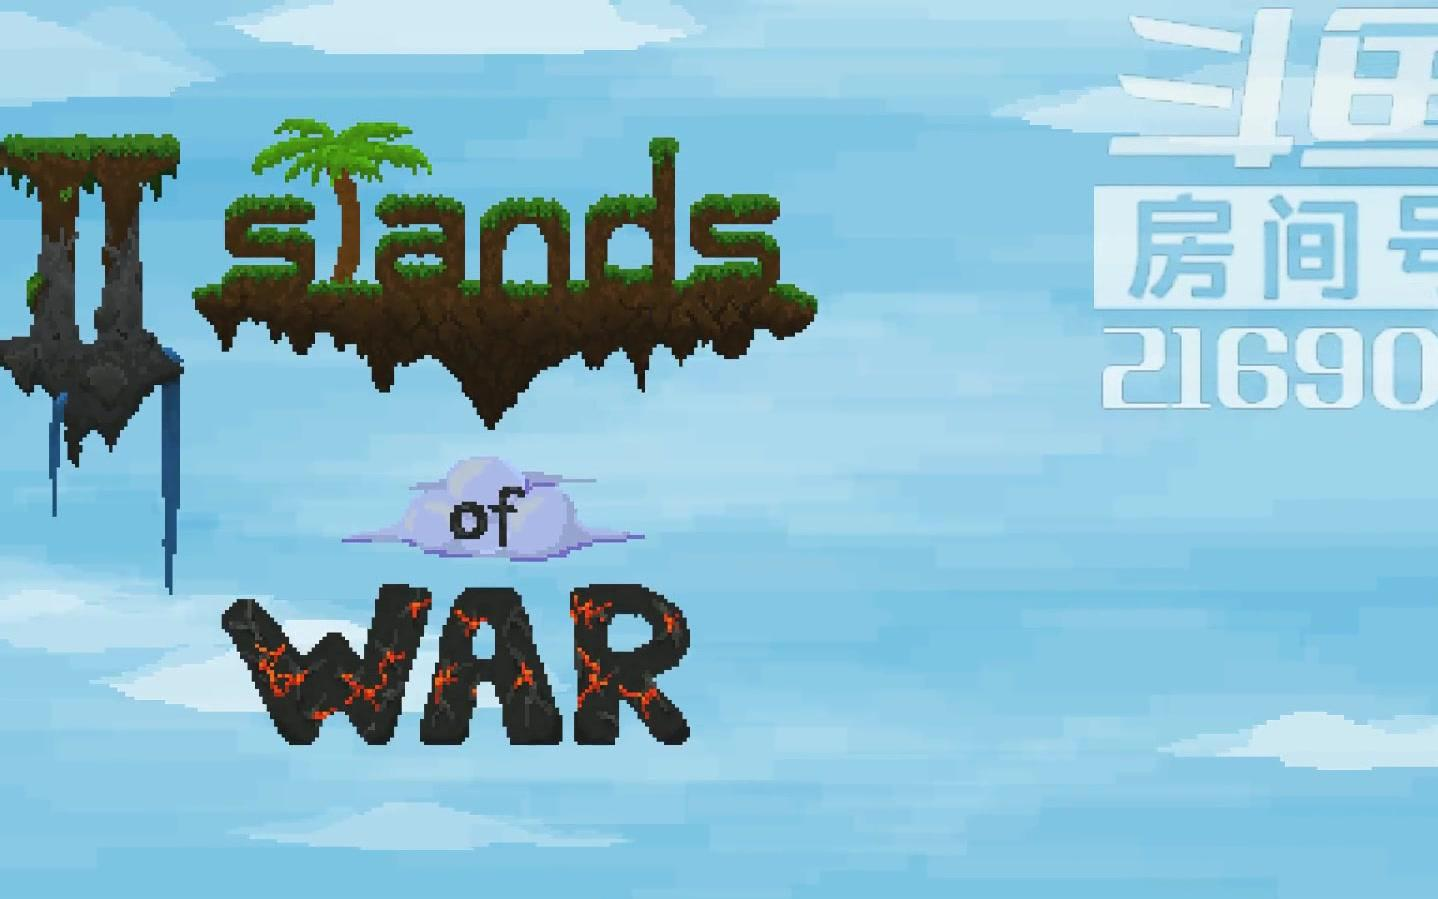 【平齐转播】8-23(3) Islands of War!逆风笑直播!